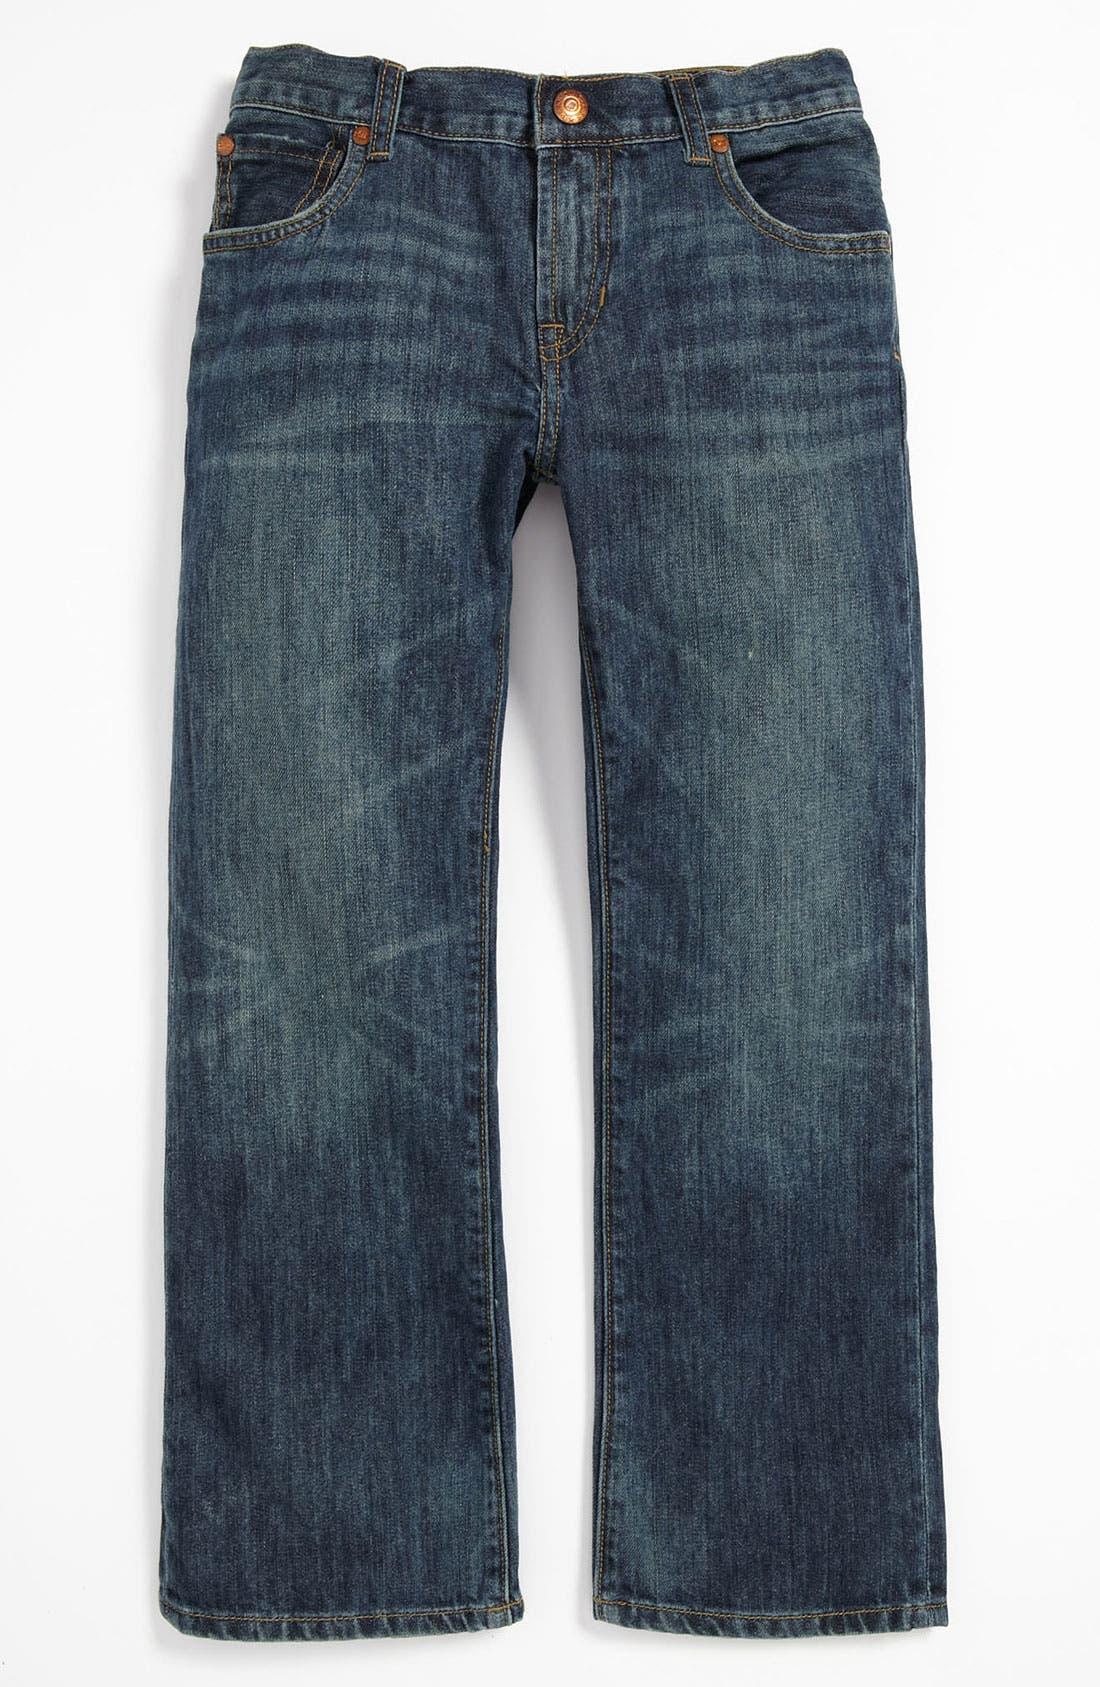 Alternate Image 2  - Peek 'Sullivan' Jeans (Toddler, Little Boys & Big Boys)